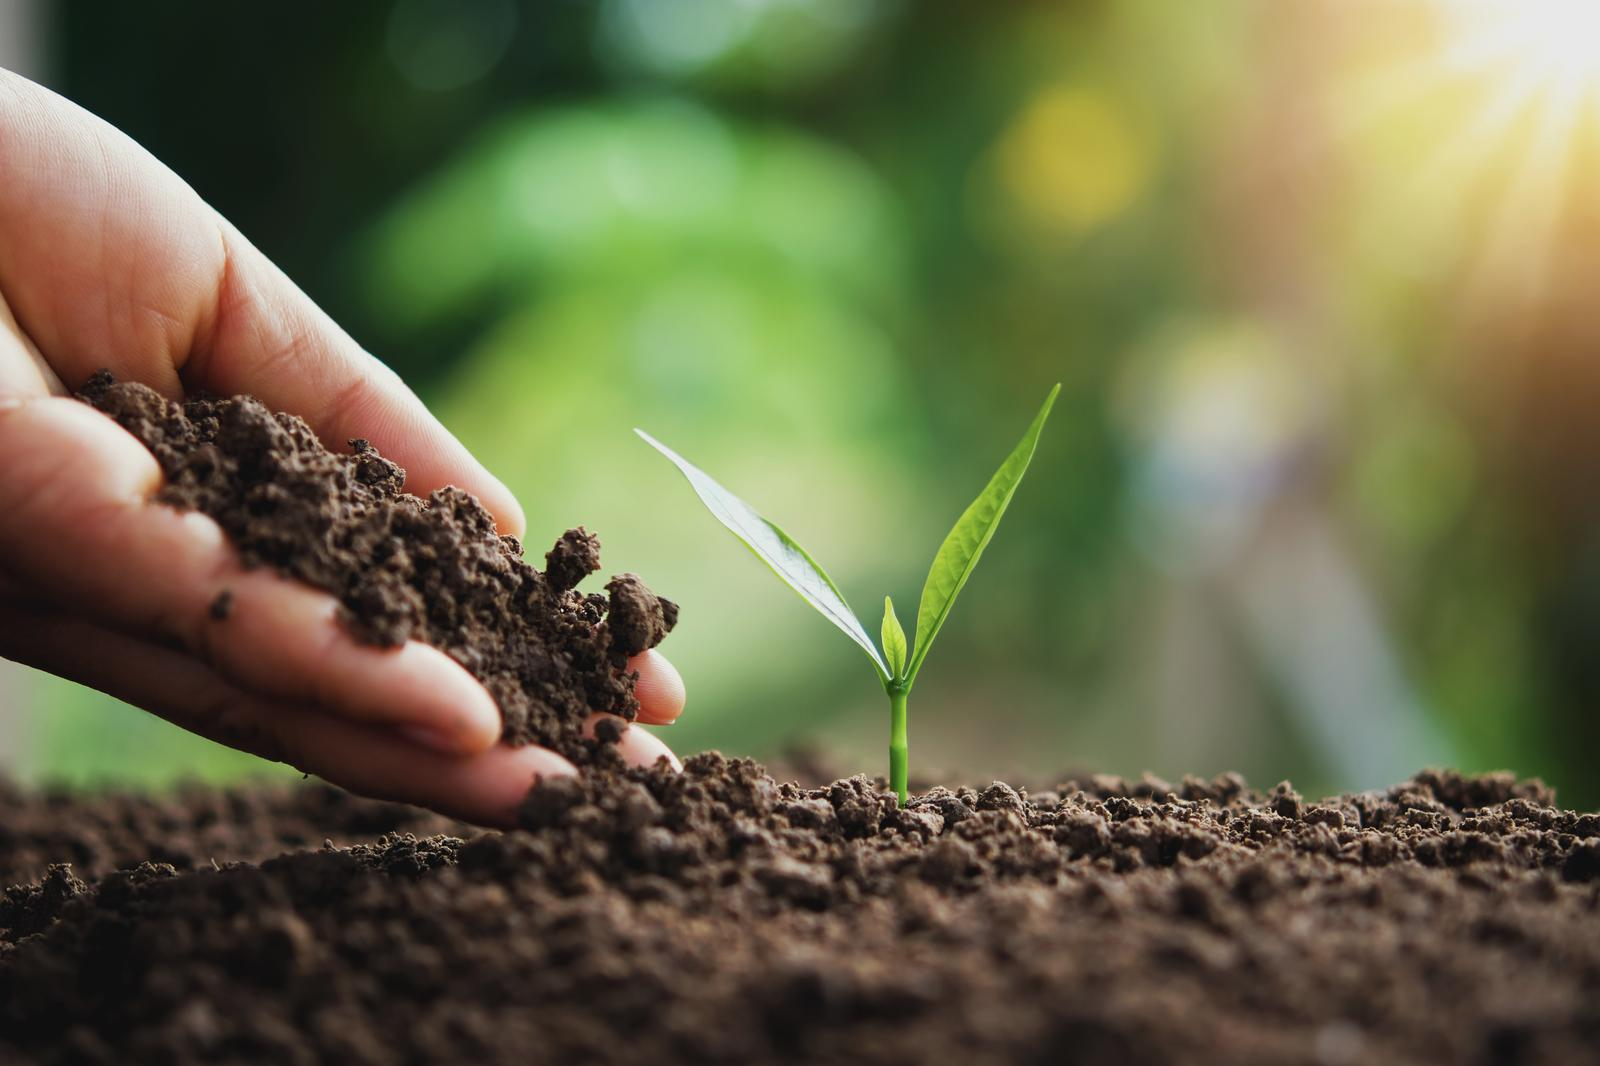 Köögivilja kasvatus Eestis